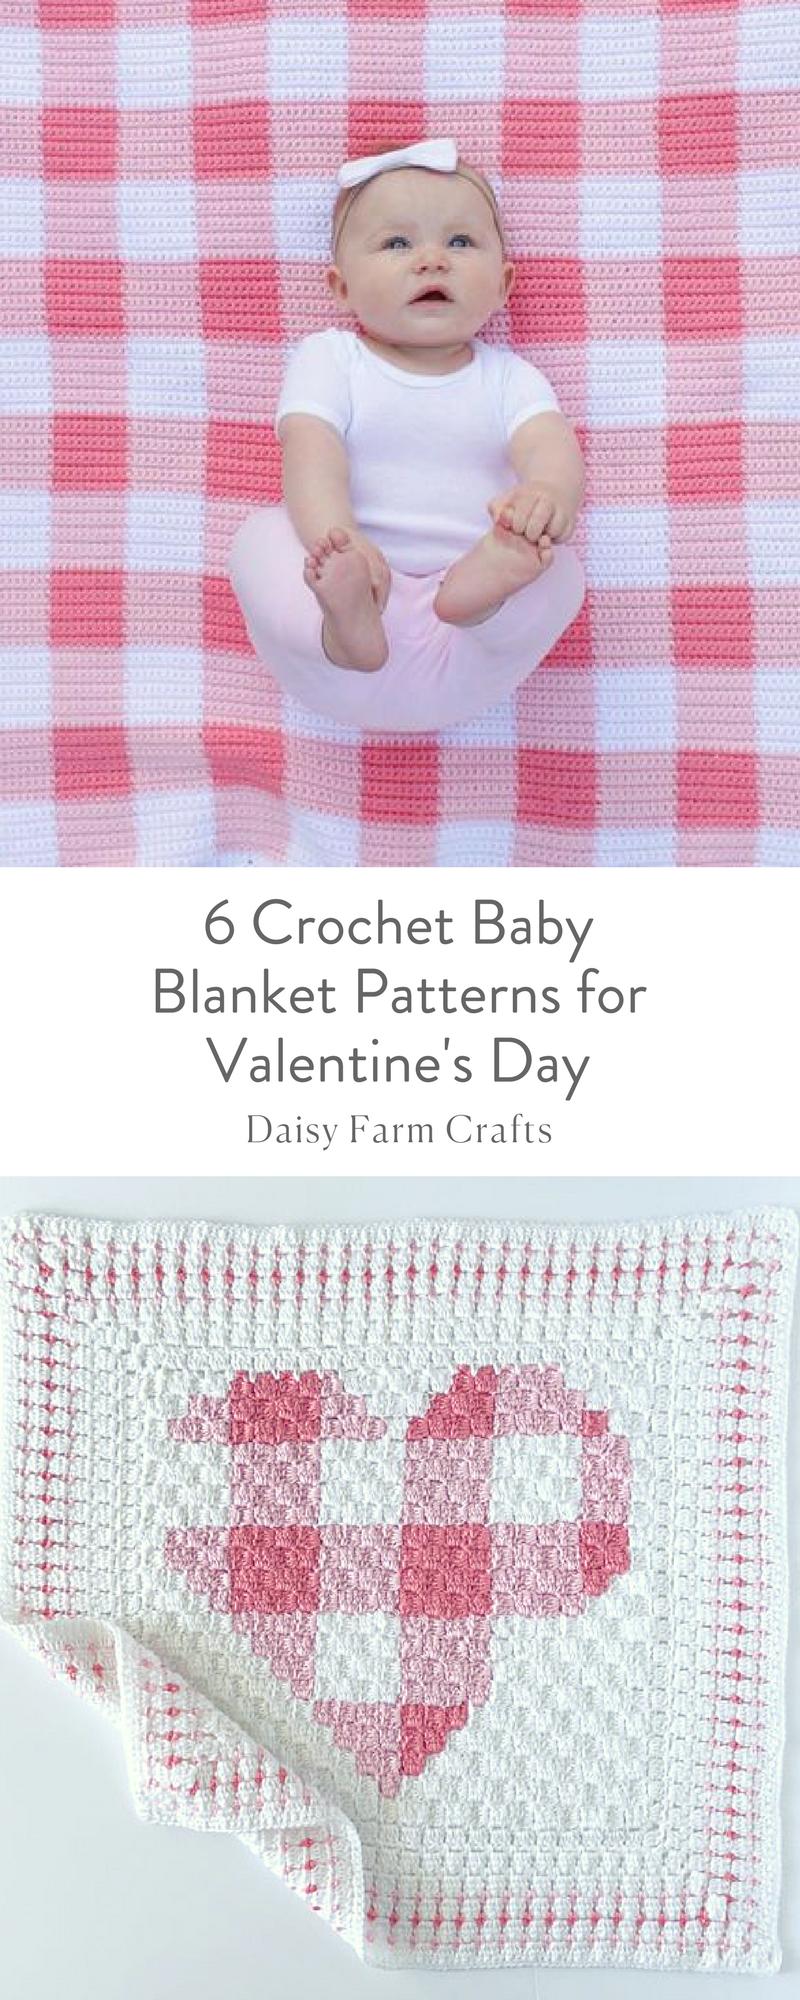 6 Crochet Baby Blanket Patterns for Valentine\'s Day | Mantas ...